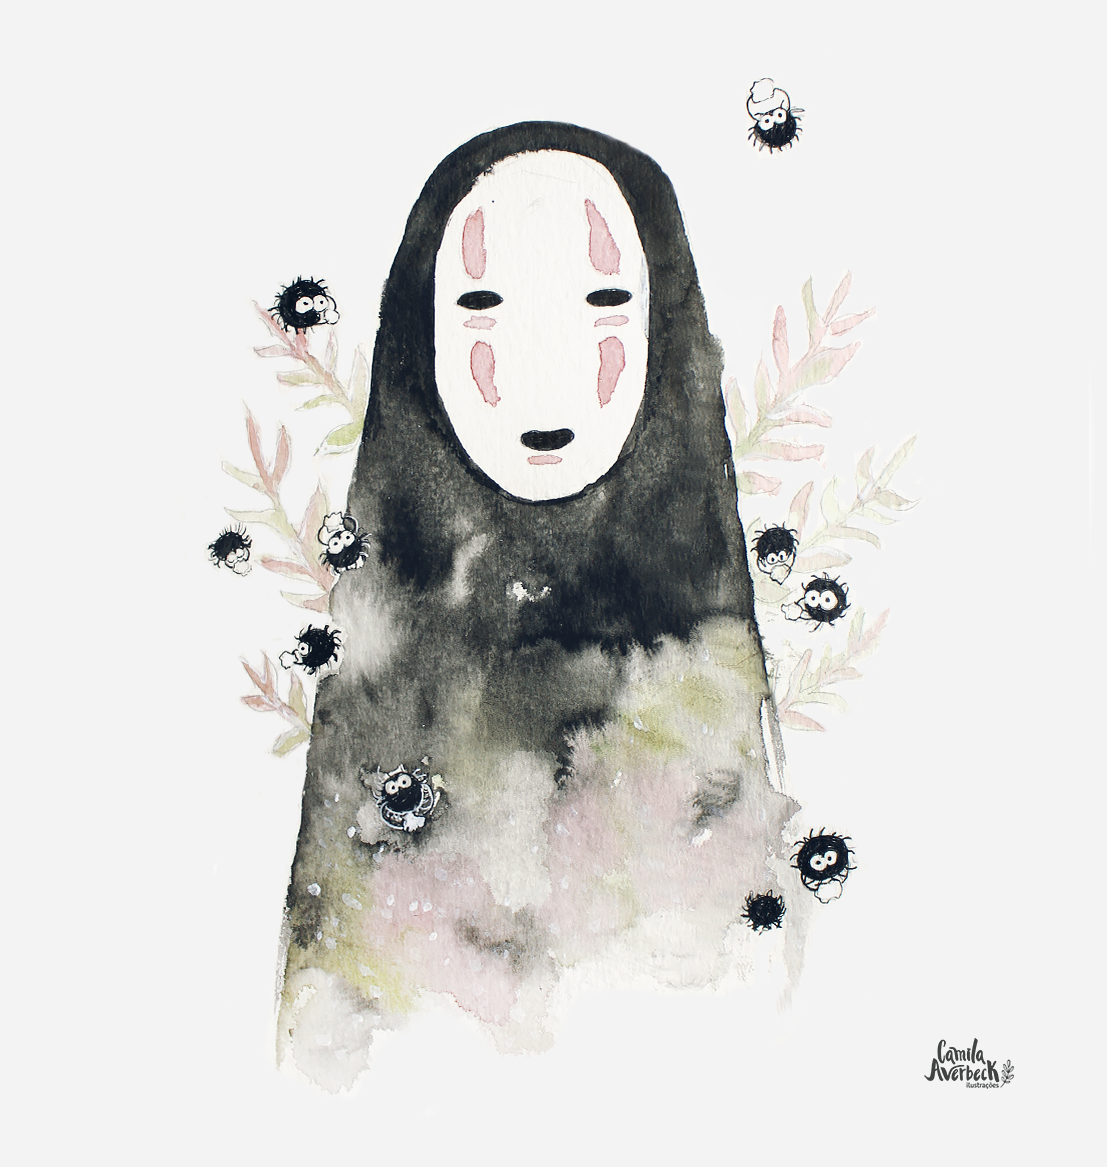 fanart no face watercolor ghibli chihiro by camila